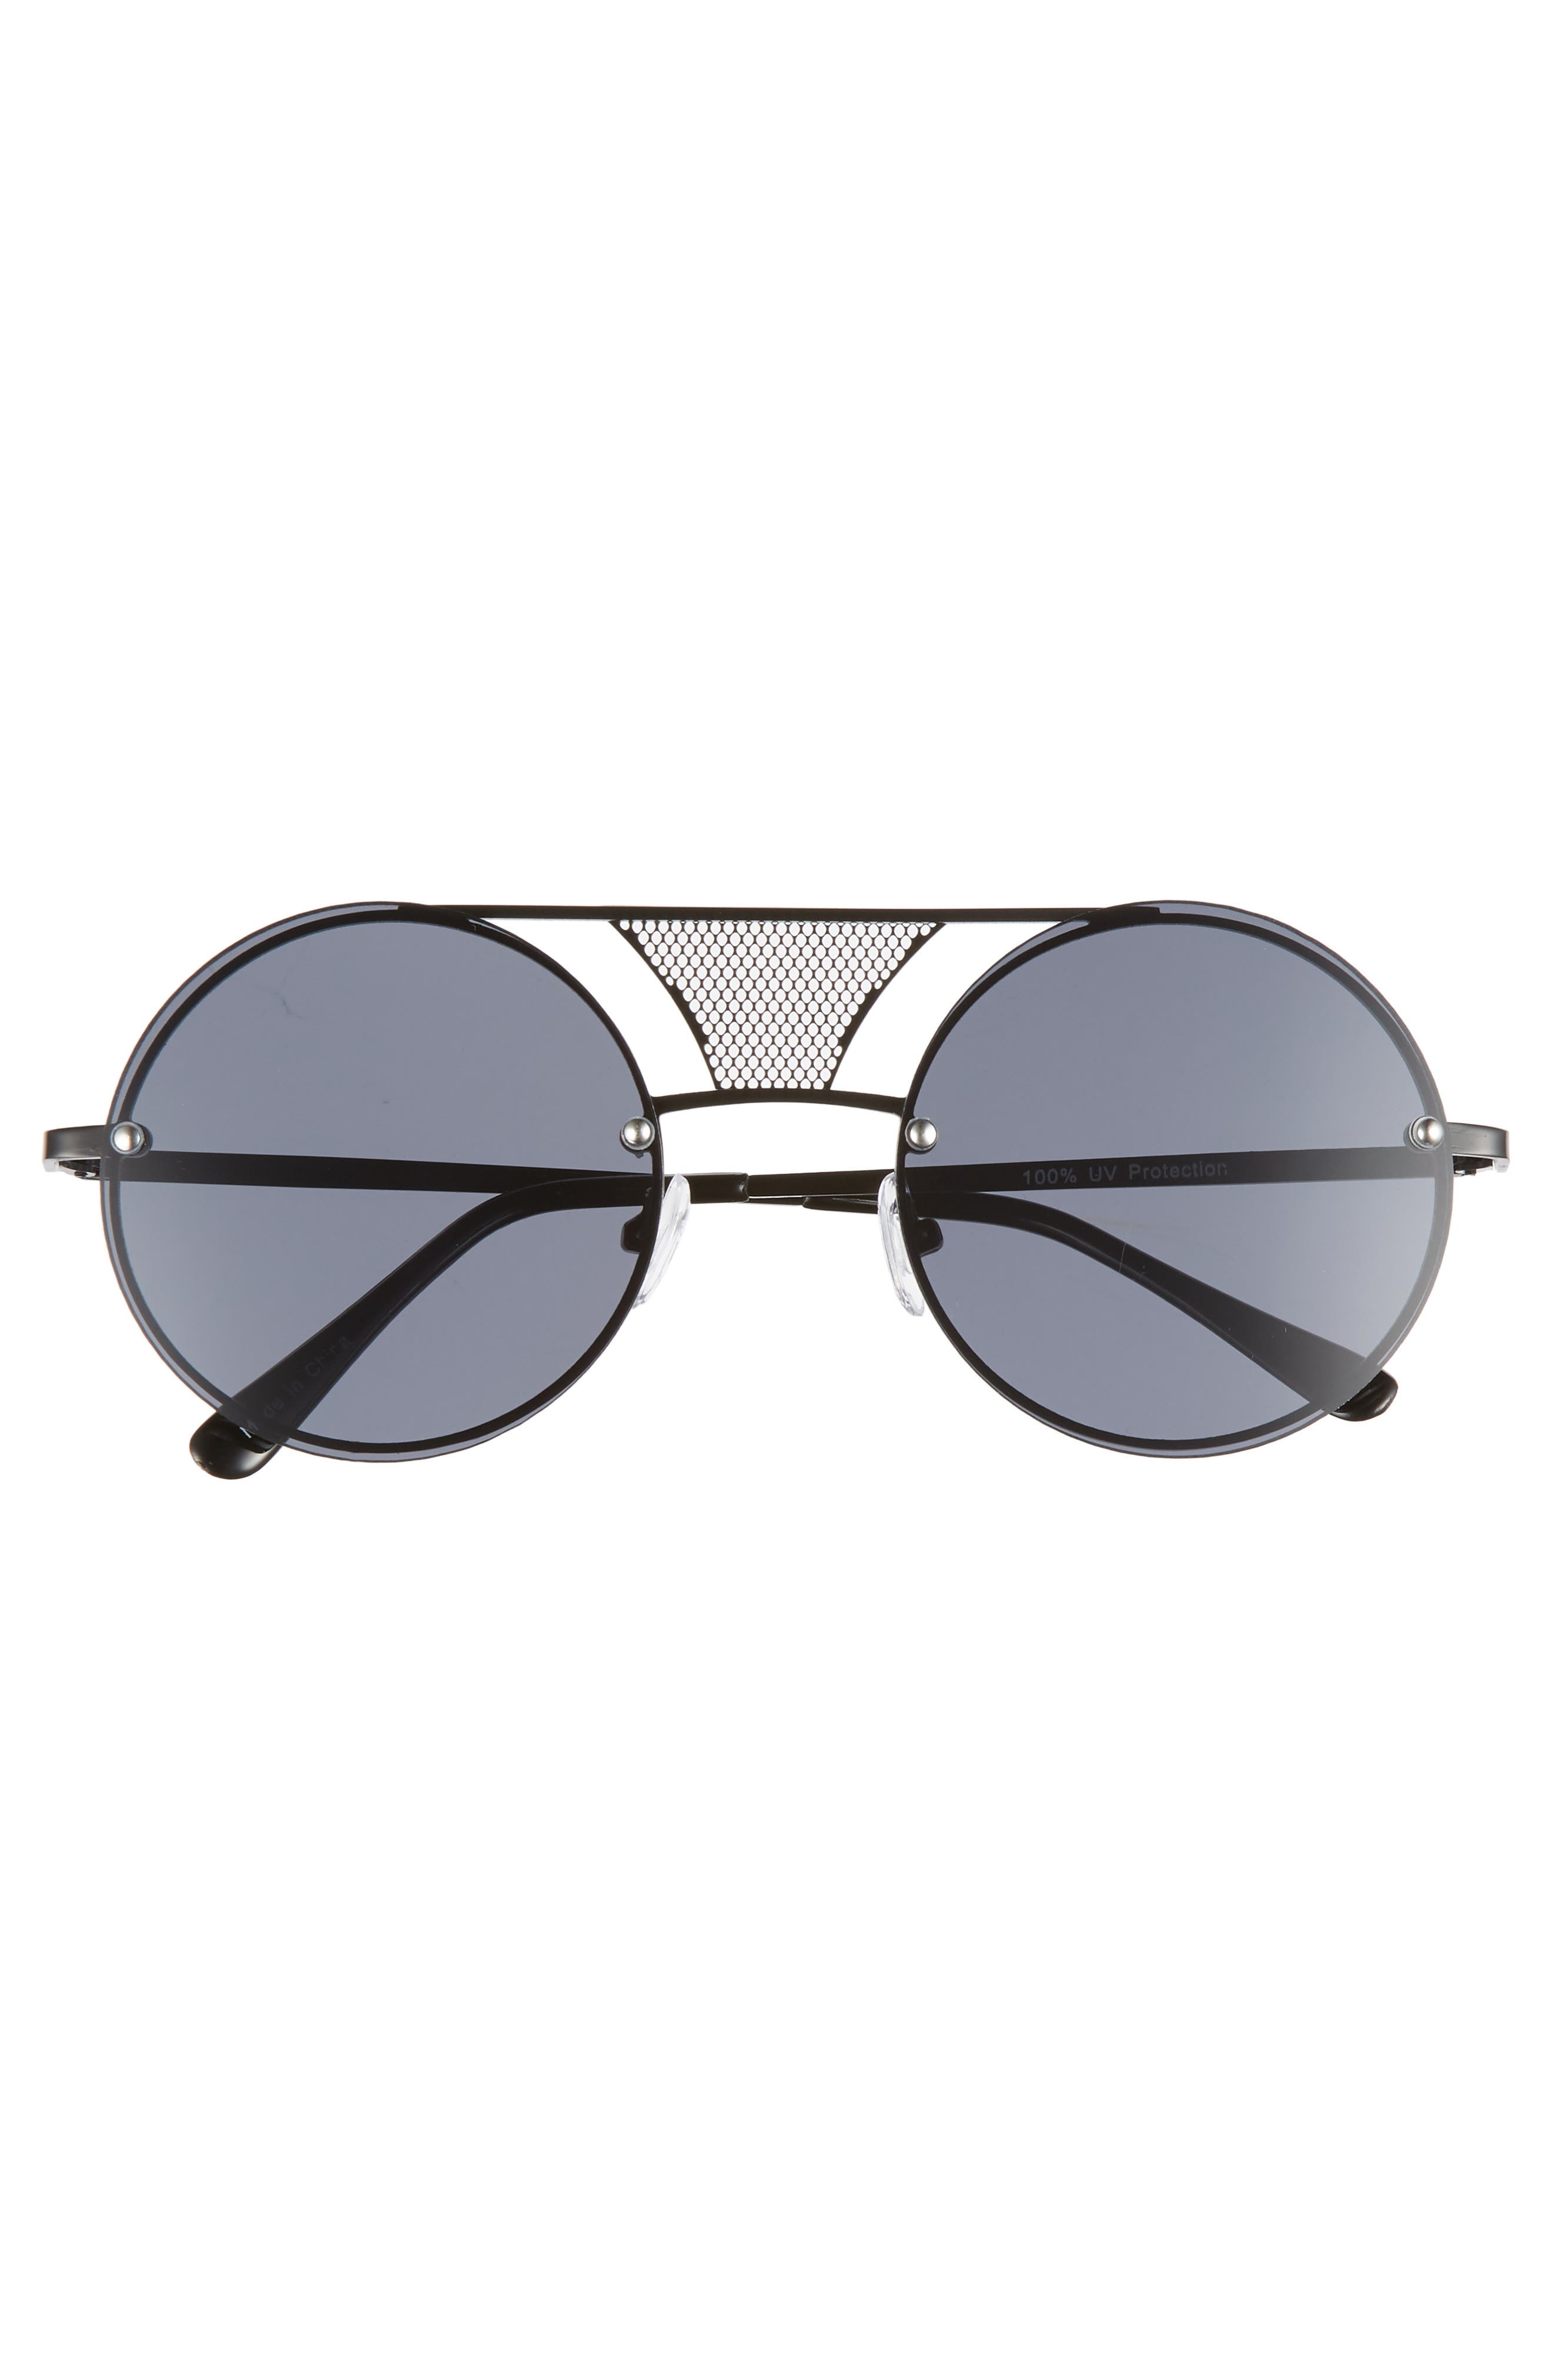 52mm Mesh Browbar Round Aviator Sunglasses,                             Alternate thumbnail 3, color,                             BLACK